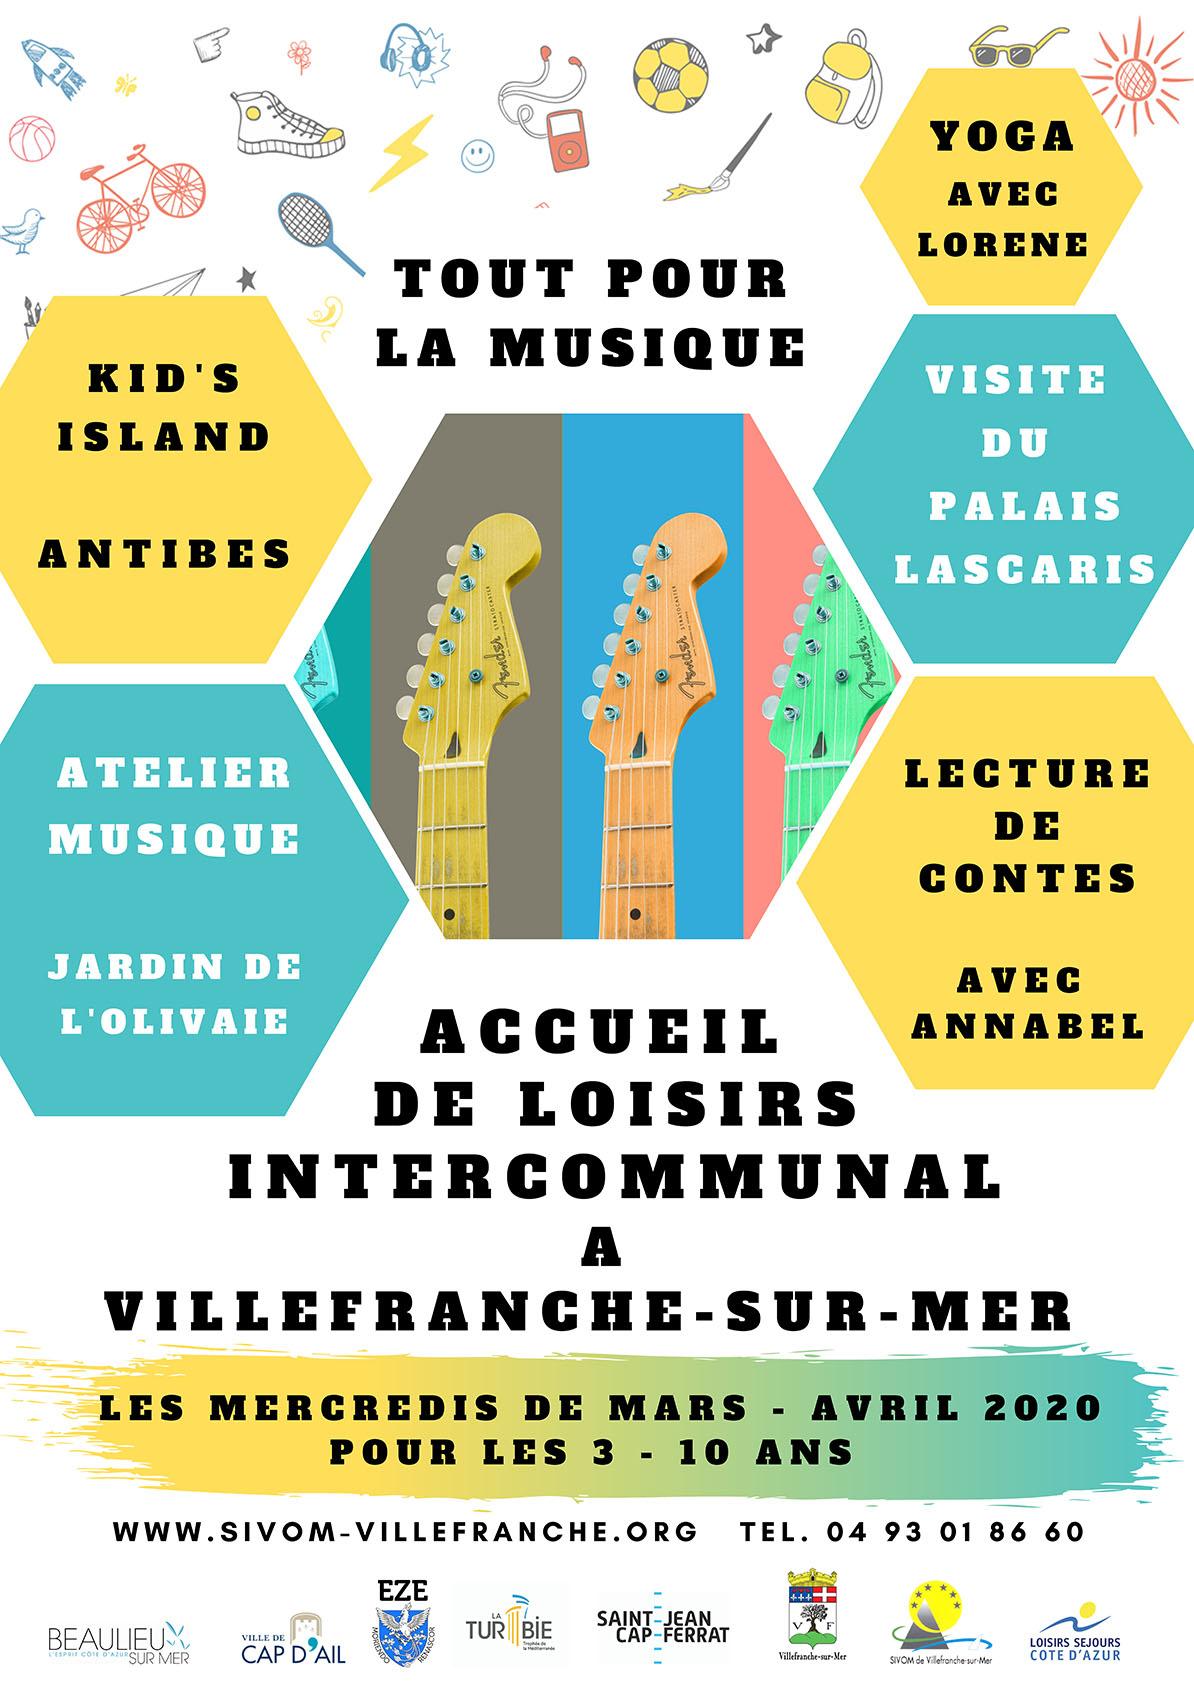 Accueil de loisirs intercommunal - Les mercredis de Mars & Avril 2020